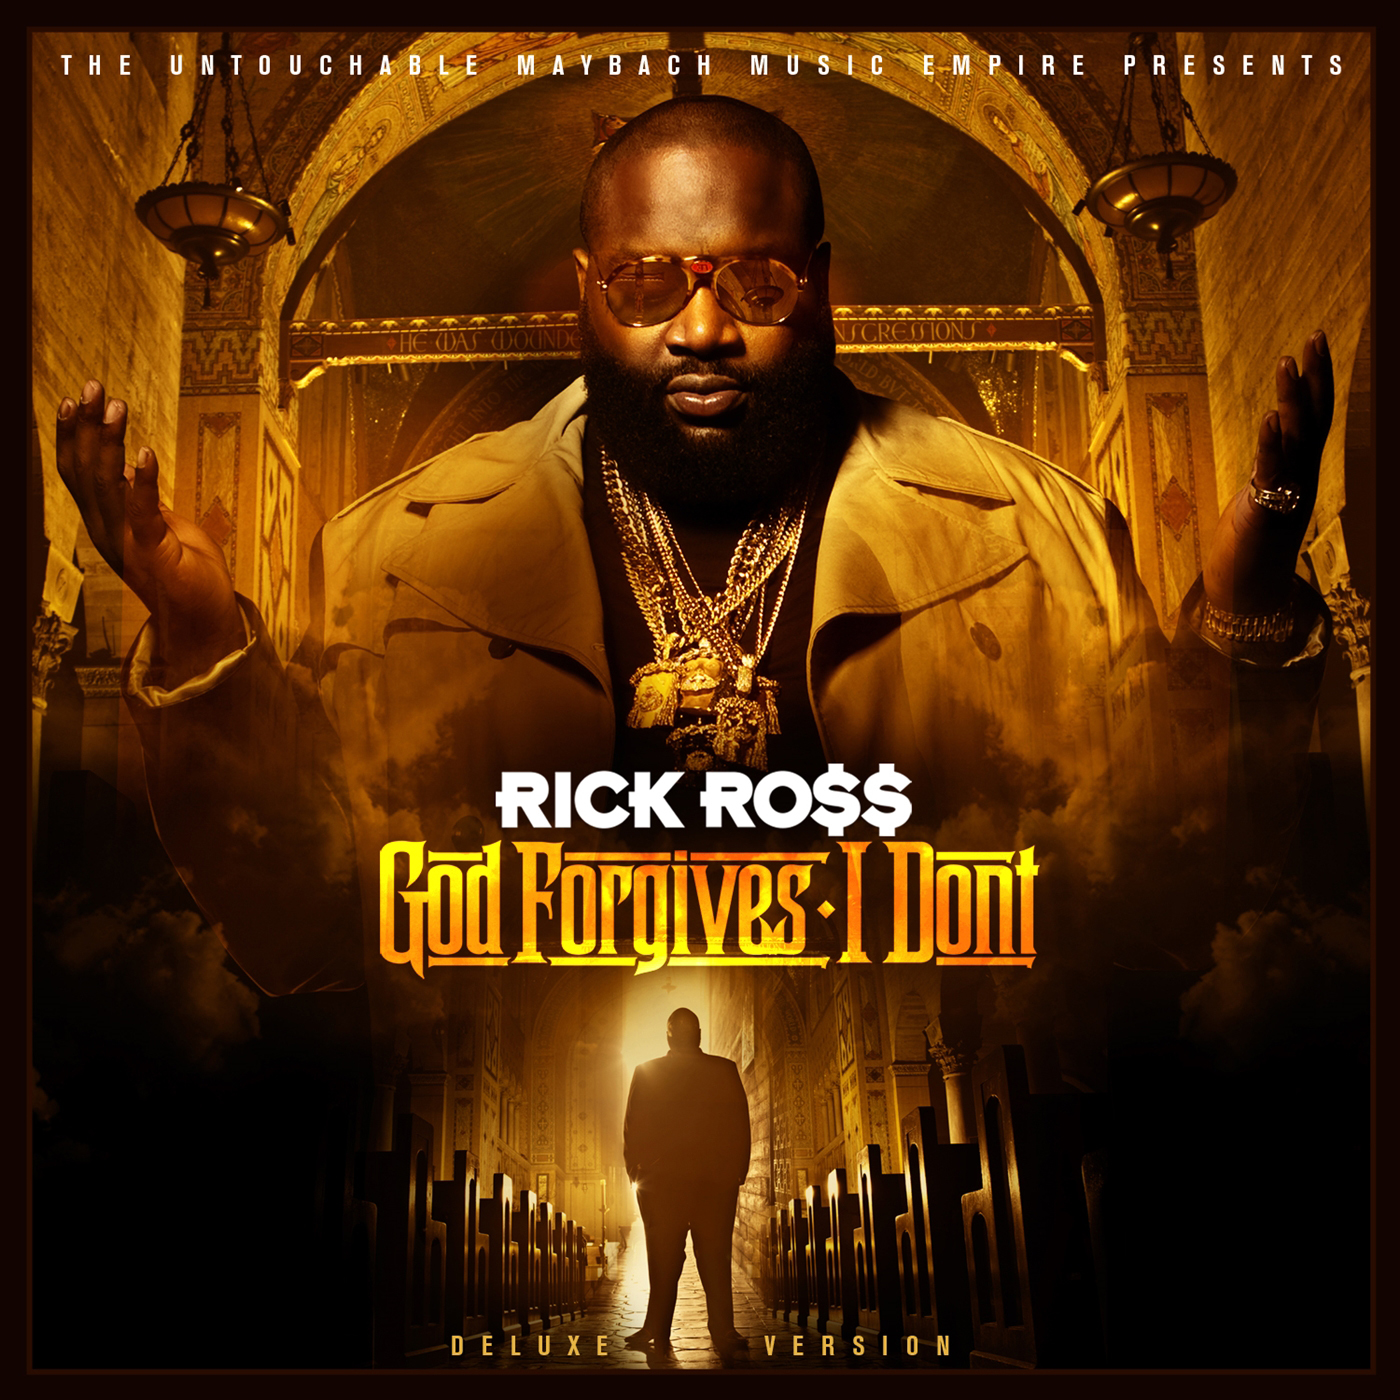 Rick Ross, God Forgives, I Don't